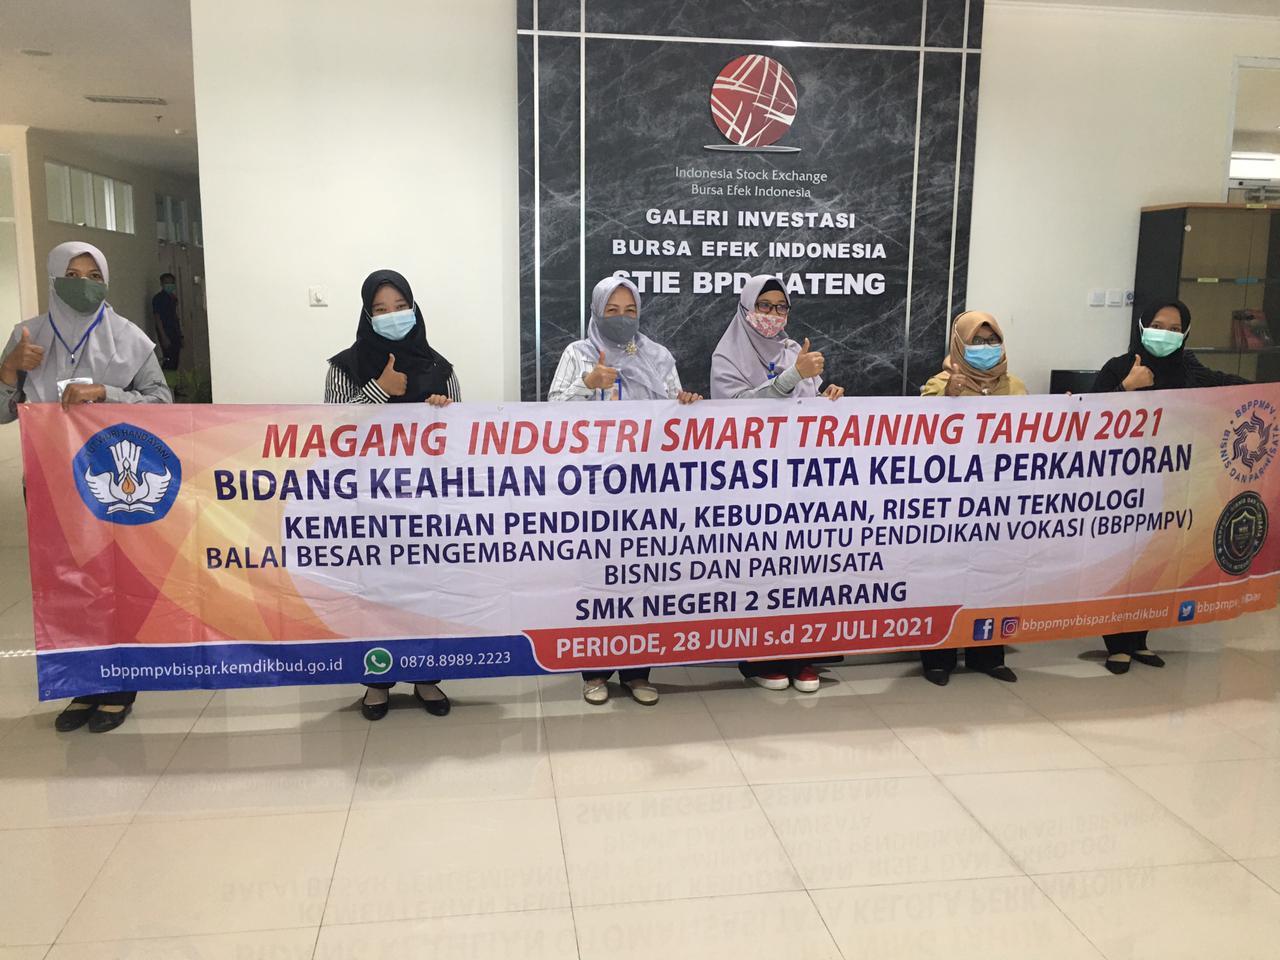 Ketua STIE Dr.E. Siti Puryandani,SE,M.Si dan Wakil Ketua II Dr. Grace Tianna Solovida,SE,M.Si,Akt Foto Bersama Guru SMK Program Magang Industri Smart Training tahun 2021.